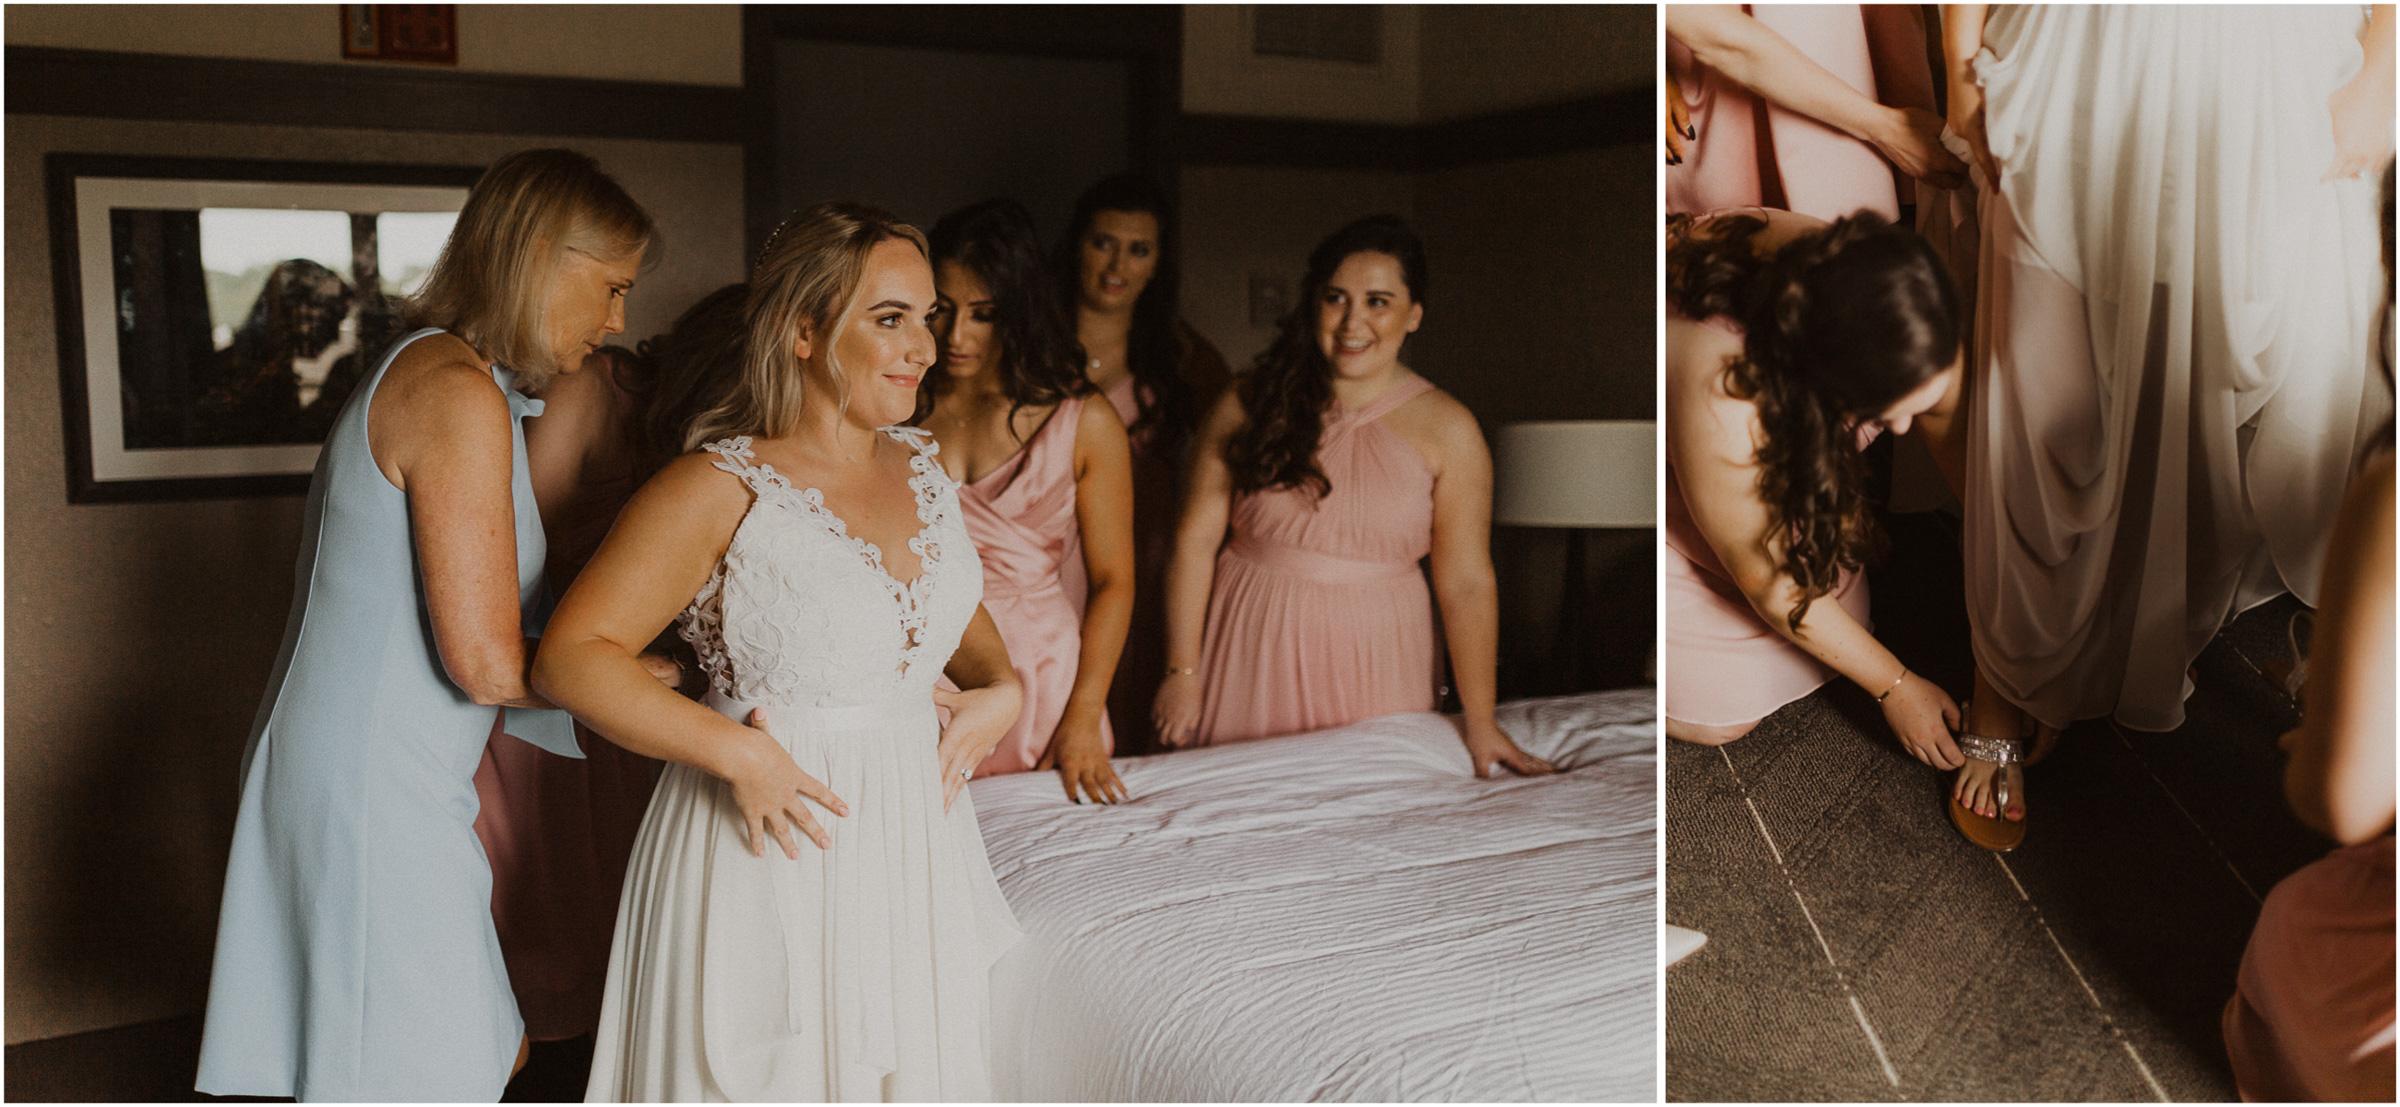 alyssa barletter photography nelson wedding nebraska city lied lodge morton barn spring wedding photographer-4.jpg